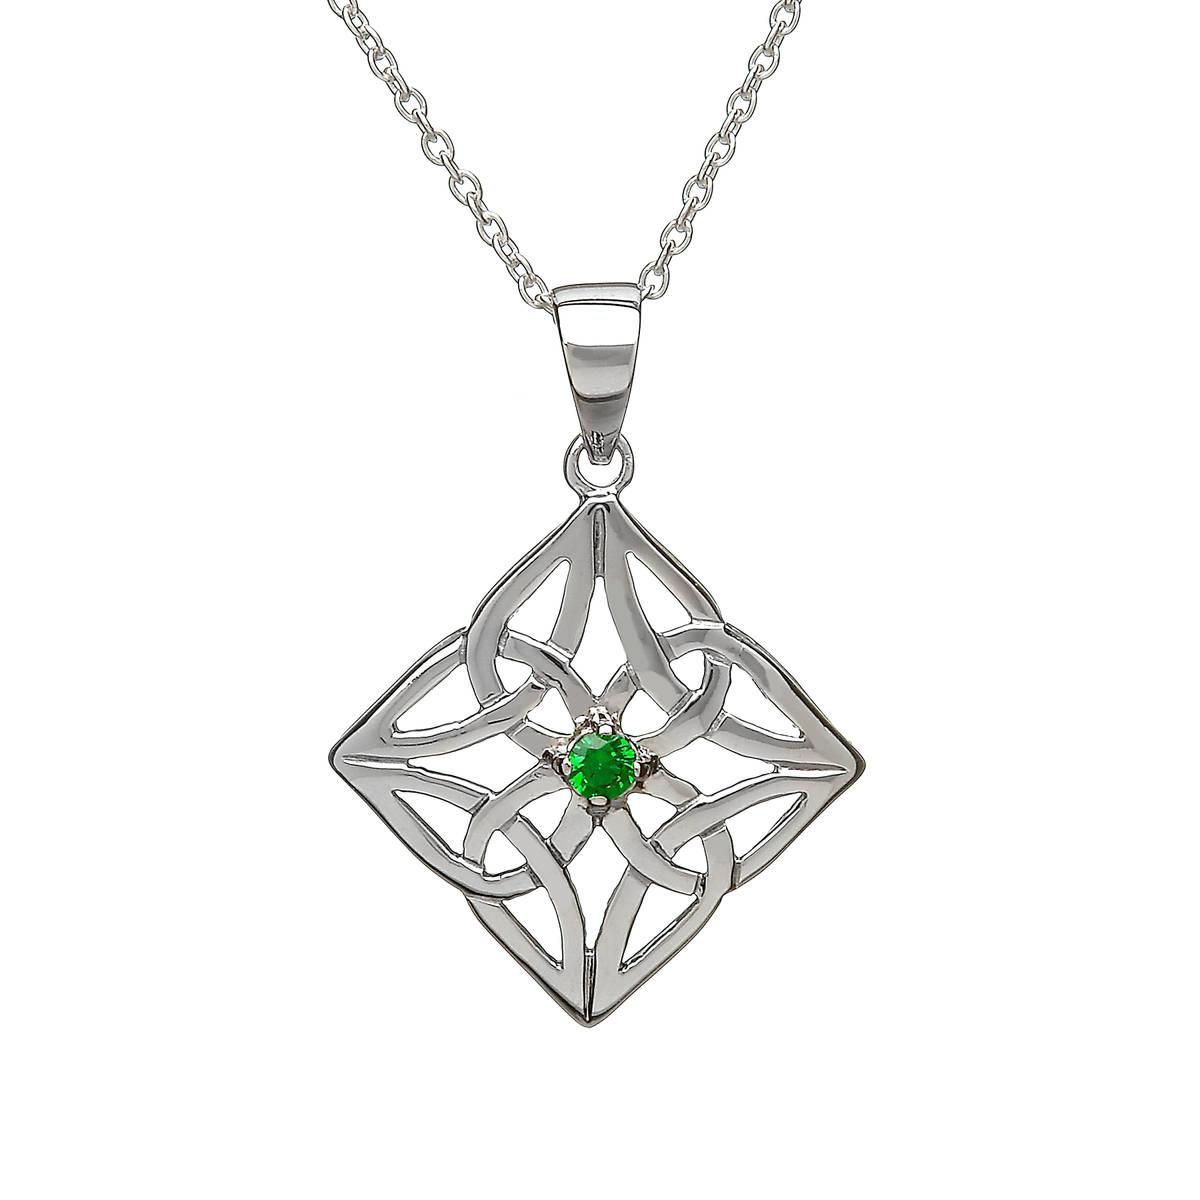 Silver Celtic Pend Diamond Shape With Drak Green Cz Centre